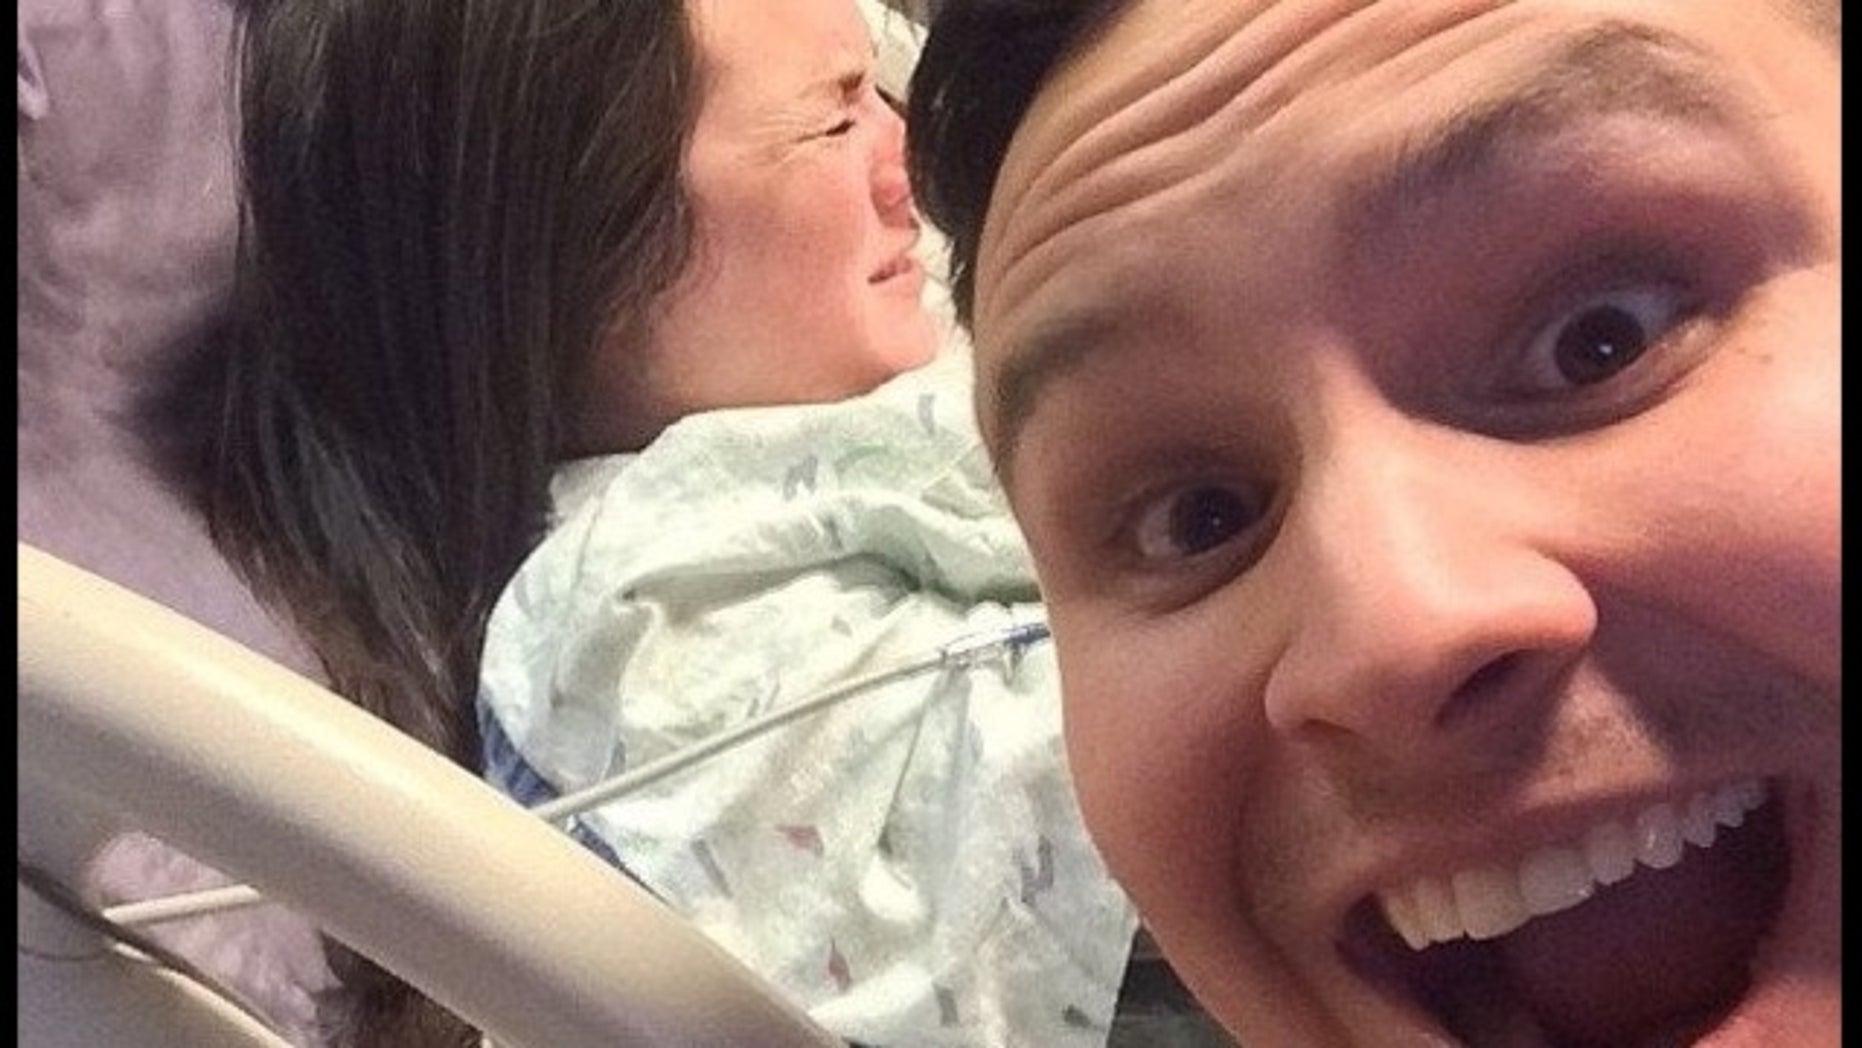 Reddit user posts selfie while wife is in labor